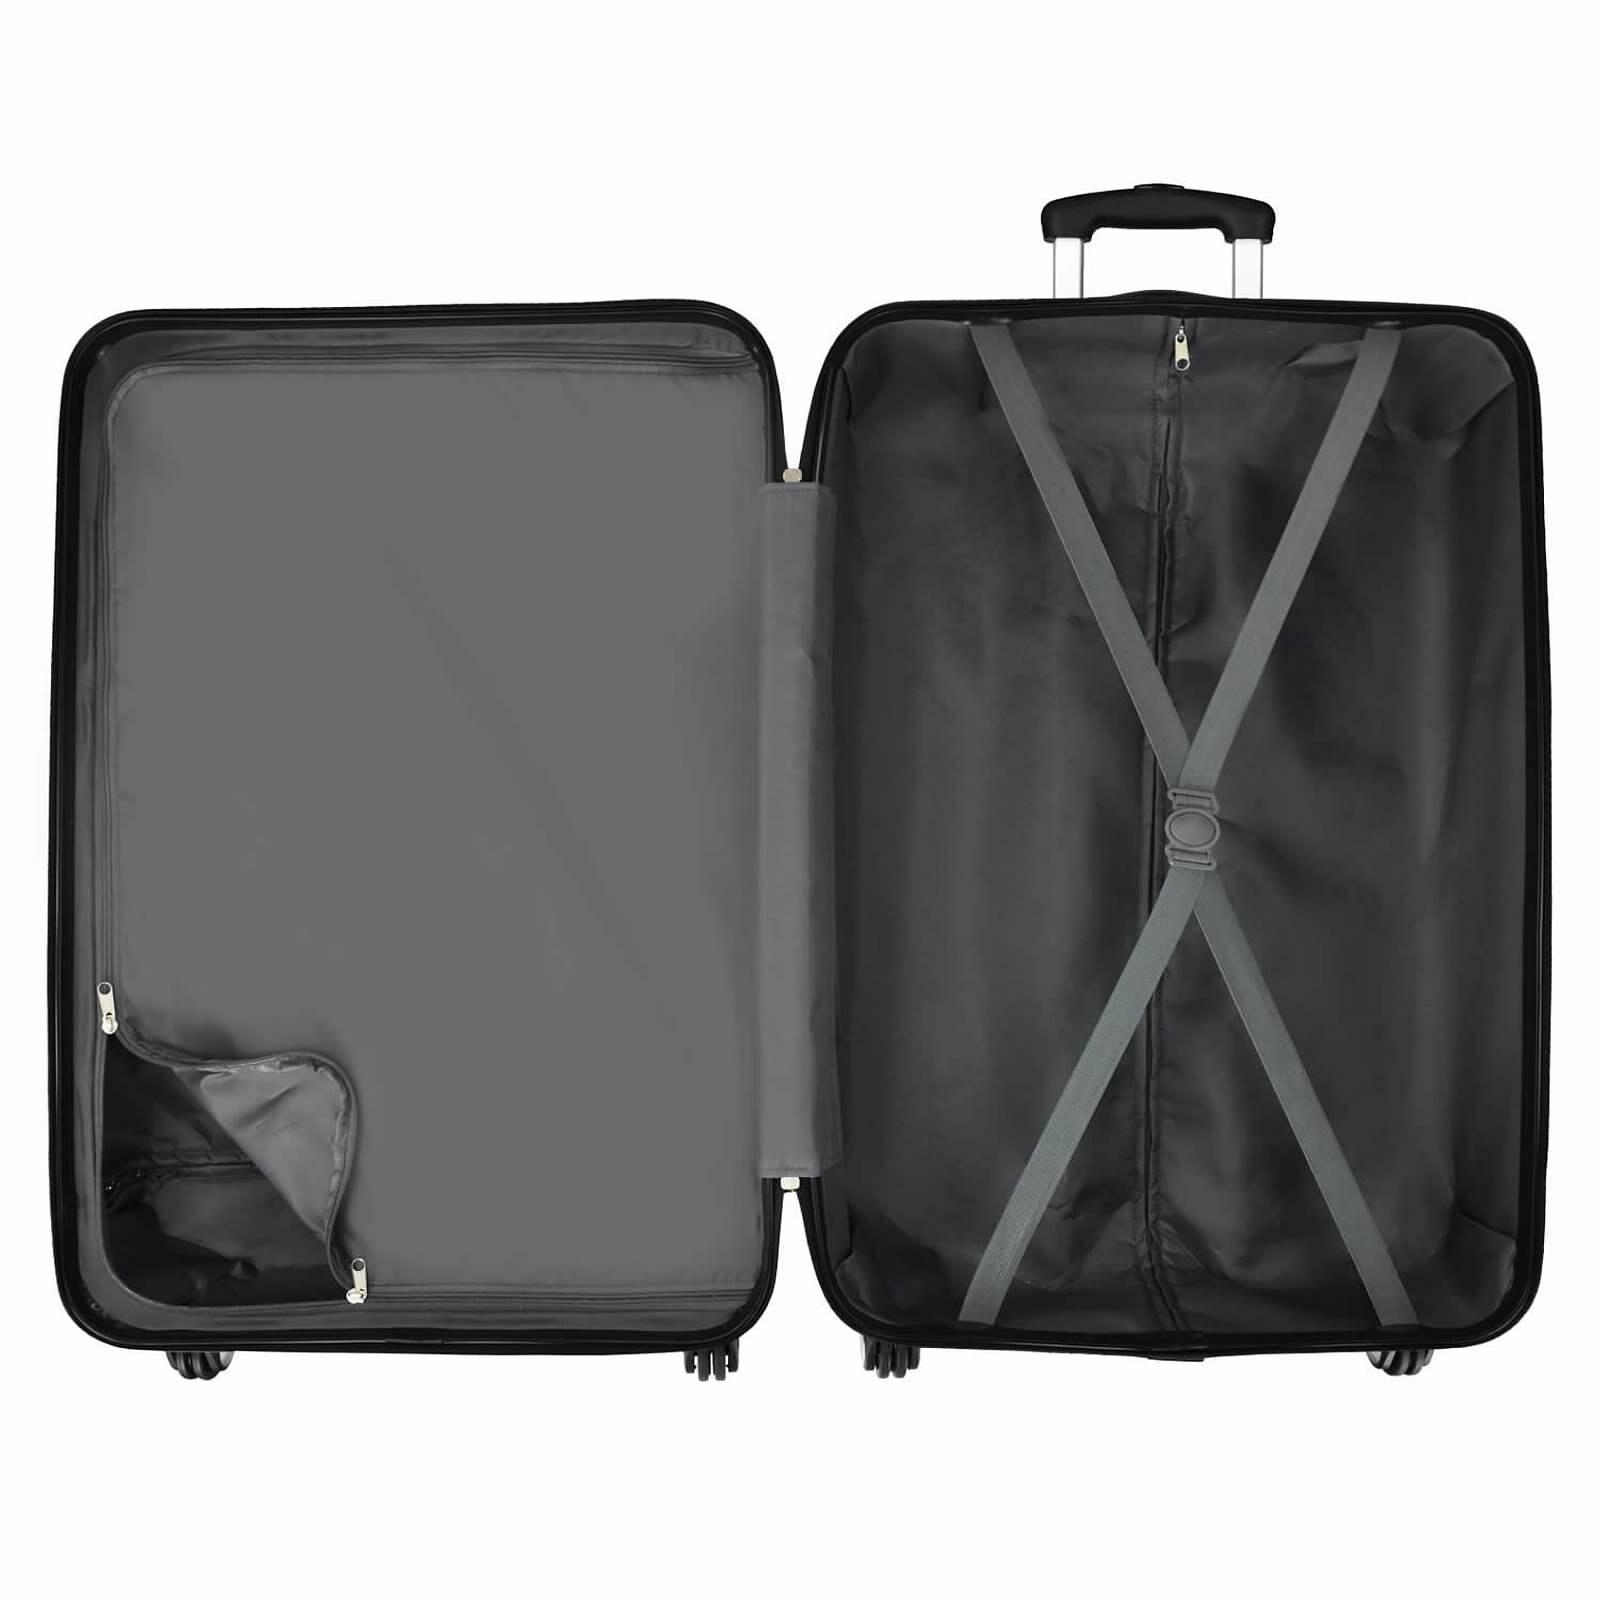 7e7d88e1ecf3 Elite Luggage Omni 3-Piece Hardside Spinner Luggage Set